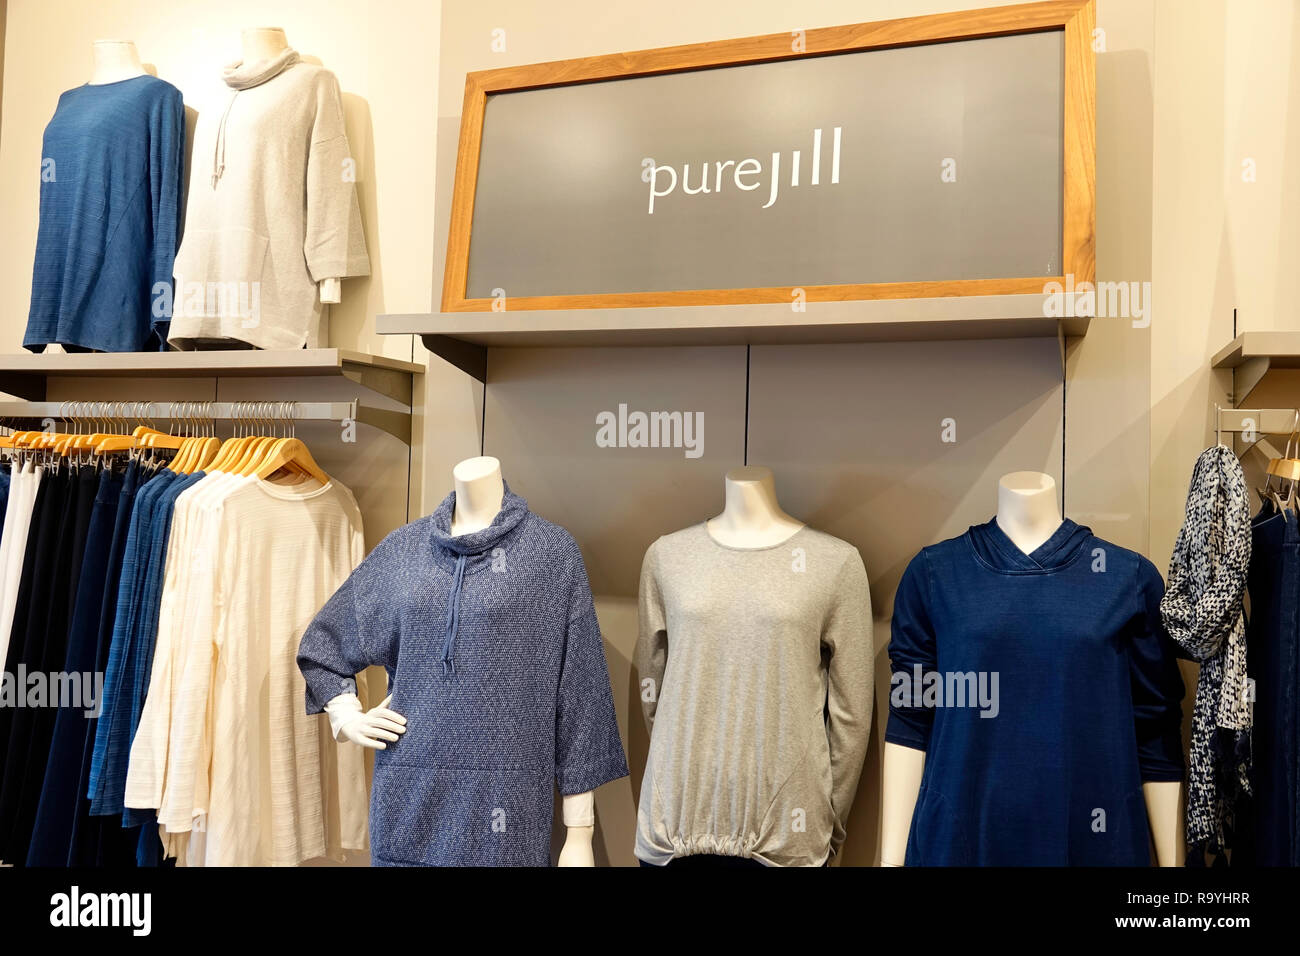 0cbb3d06aec Fort Ft. Lauderdale Florida Pembroke Pines Shops At Pembroke Gardens mall  shopping J. Jill